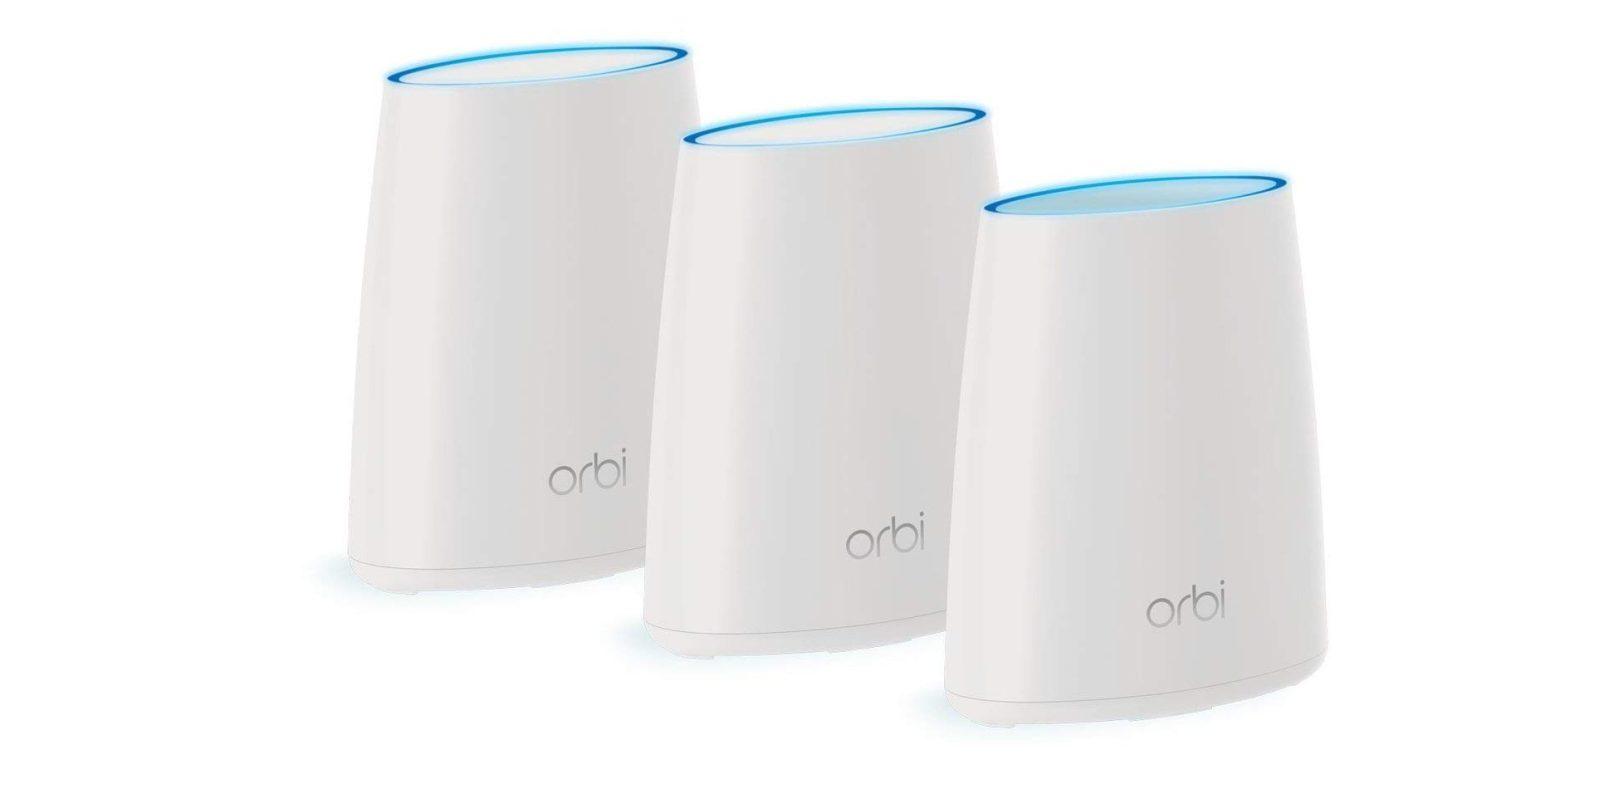 NETGEAR Orbi 802.11ac Mesh Wi-Fi System is $210, today only (Cert. Refurb, Orig. $350)